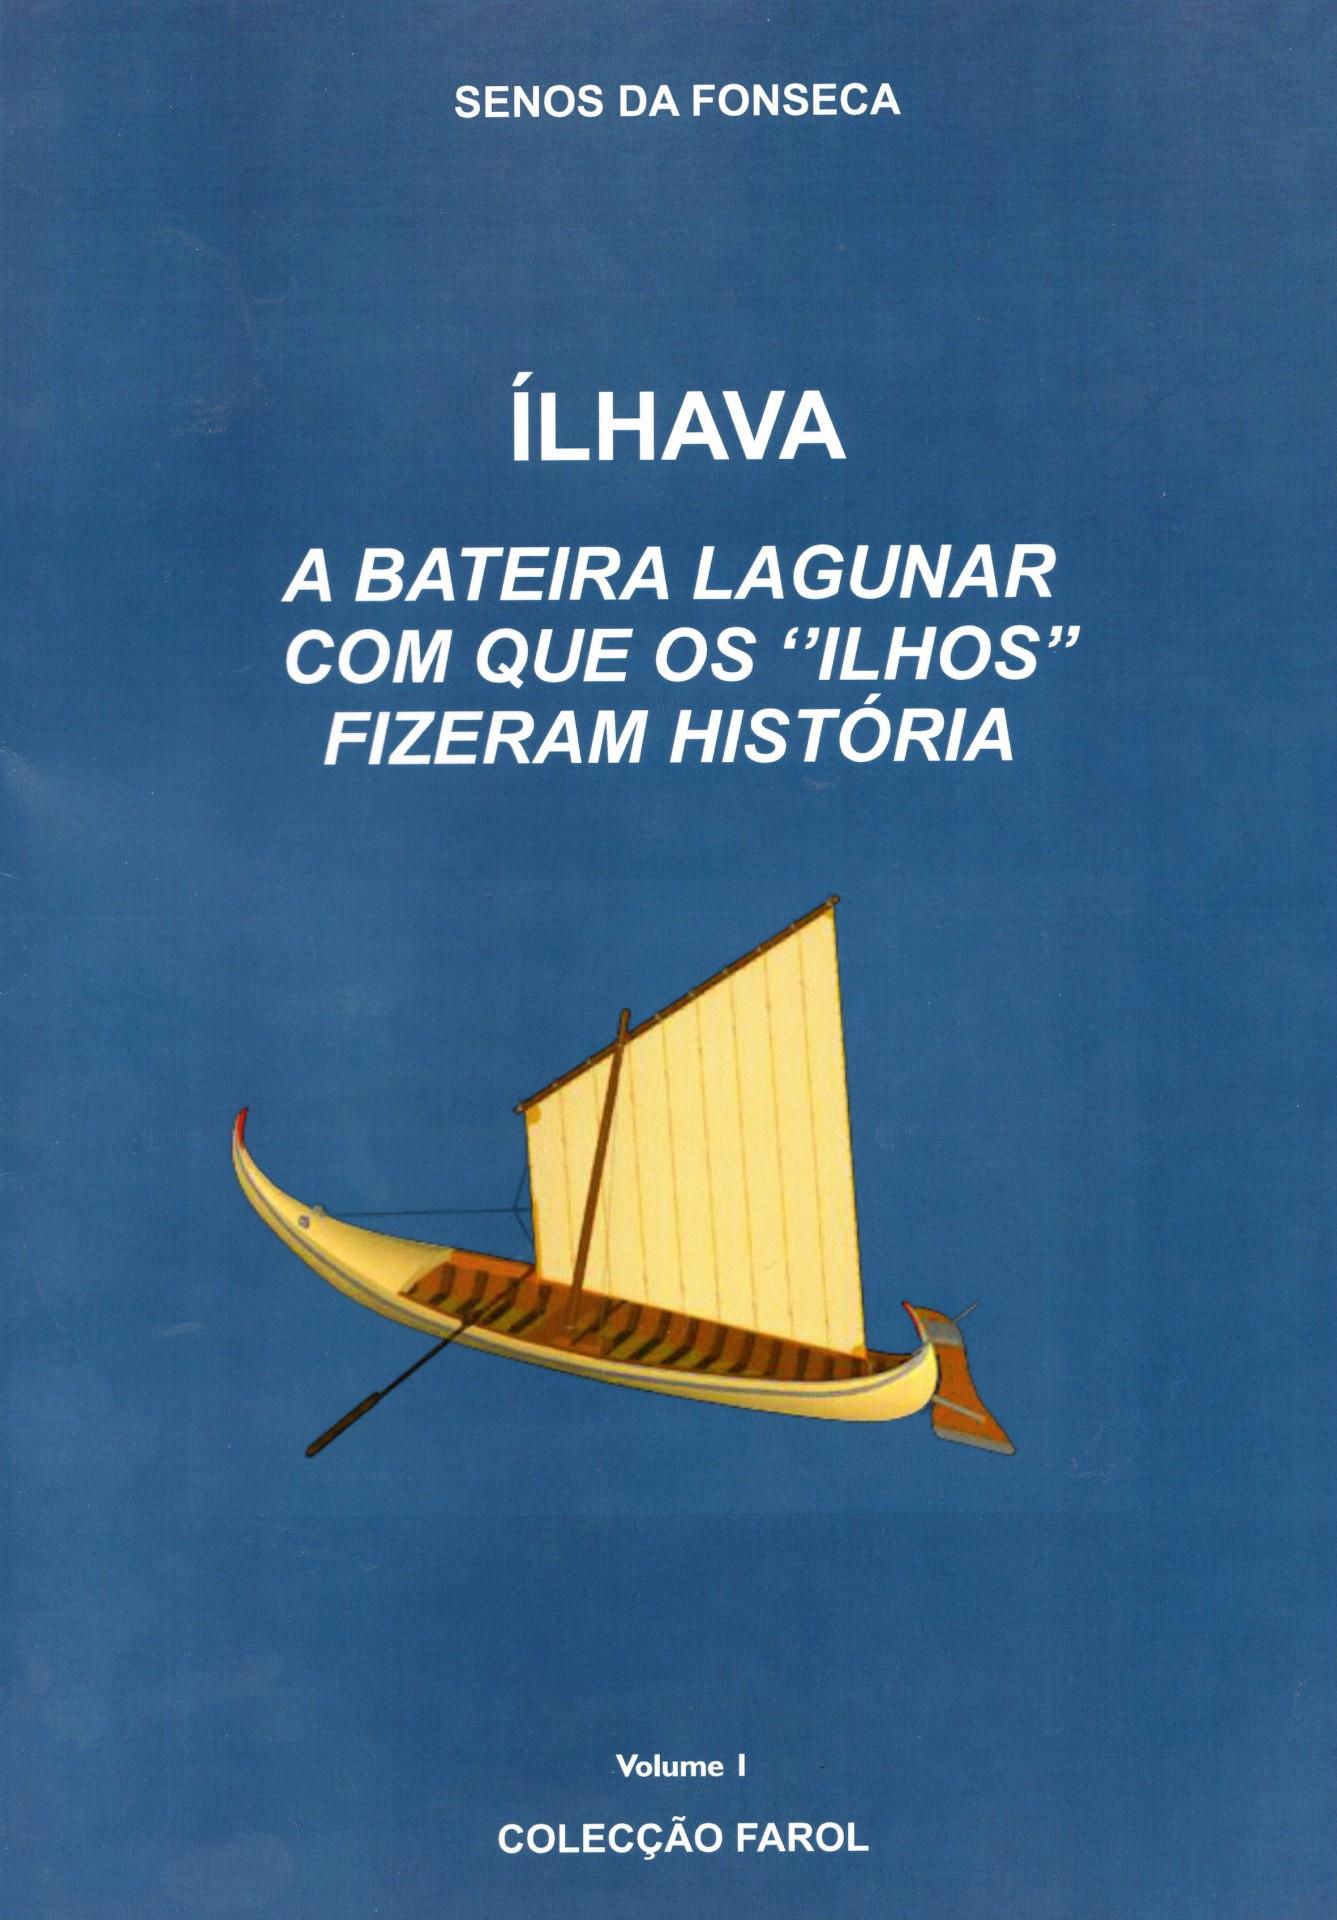 Ílhava